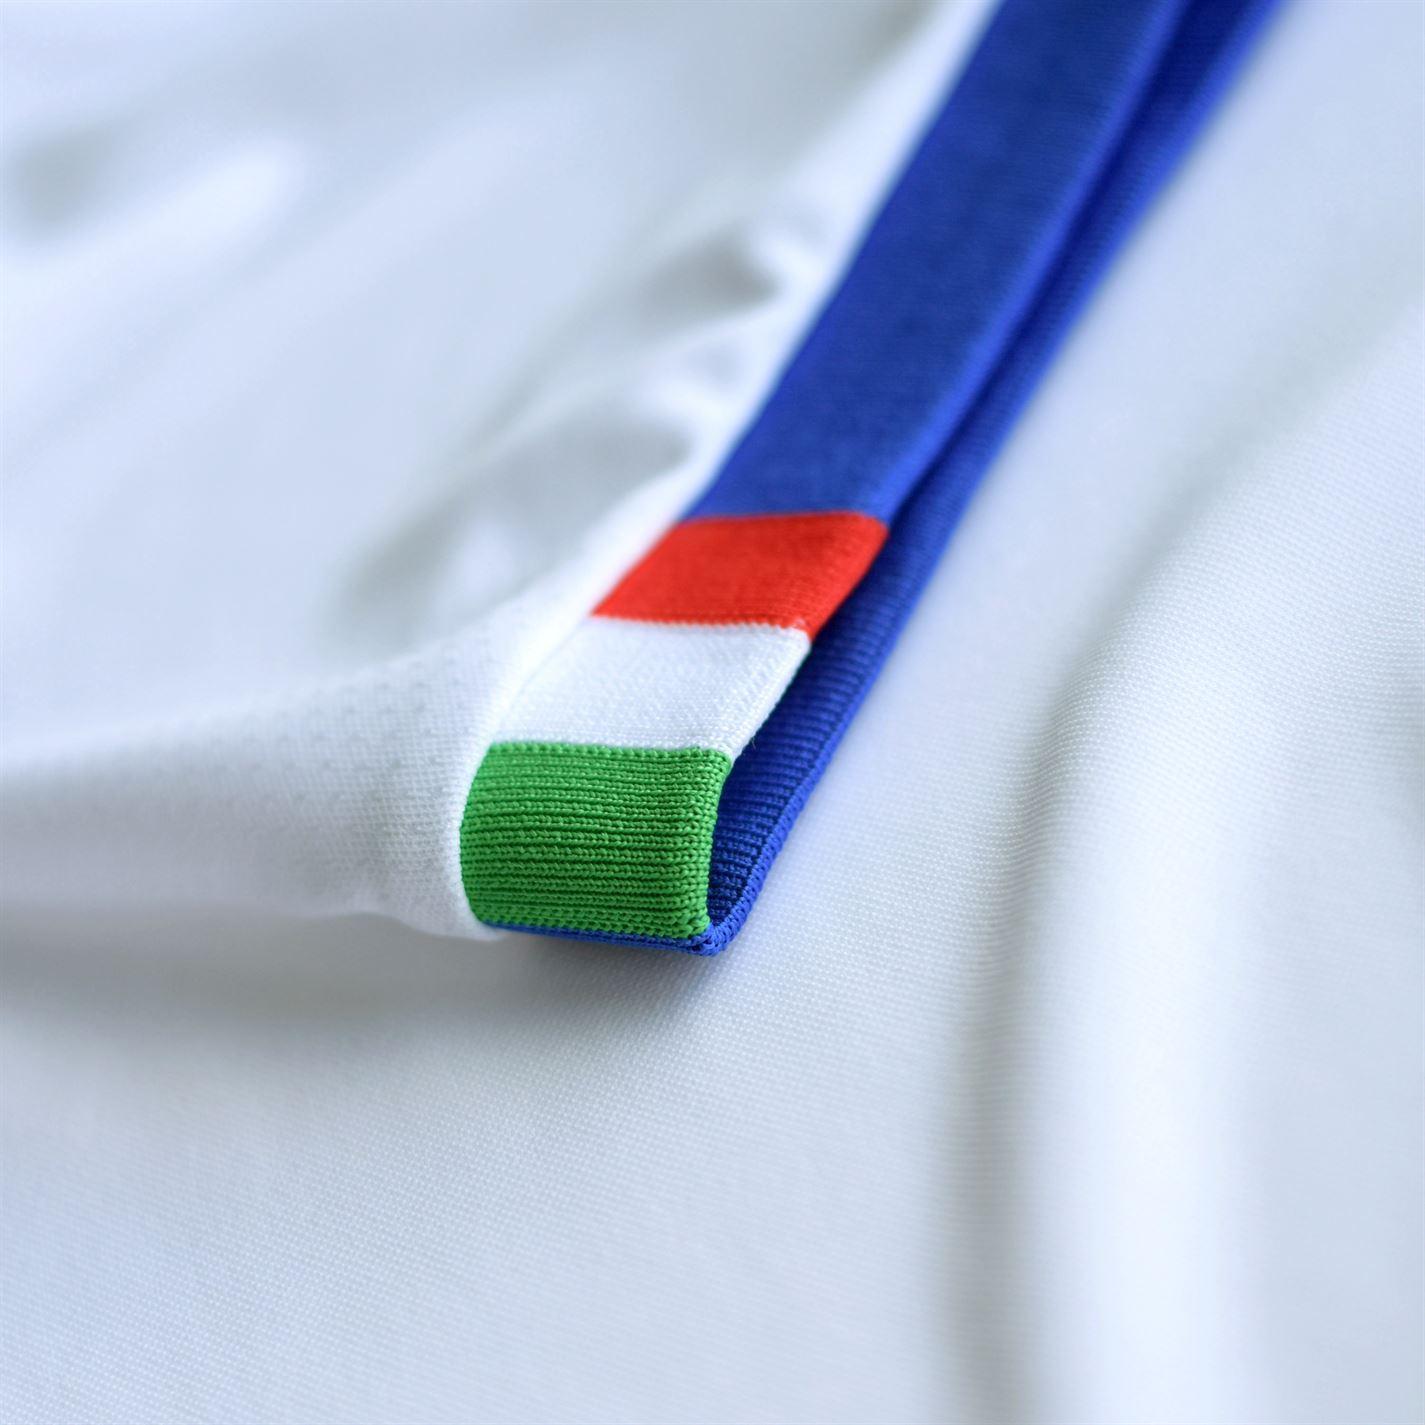 87c179773 Puma Italy Away Jersey 2018 Italia Juniors White/Blue Football Soccer Shirt  Top